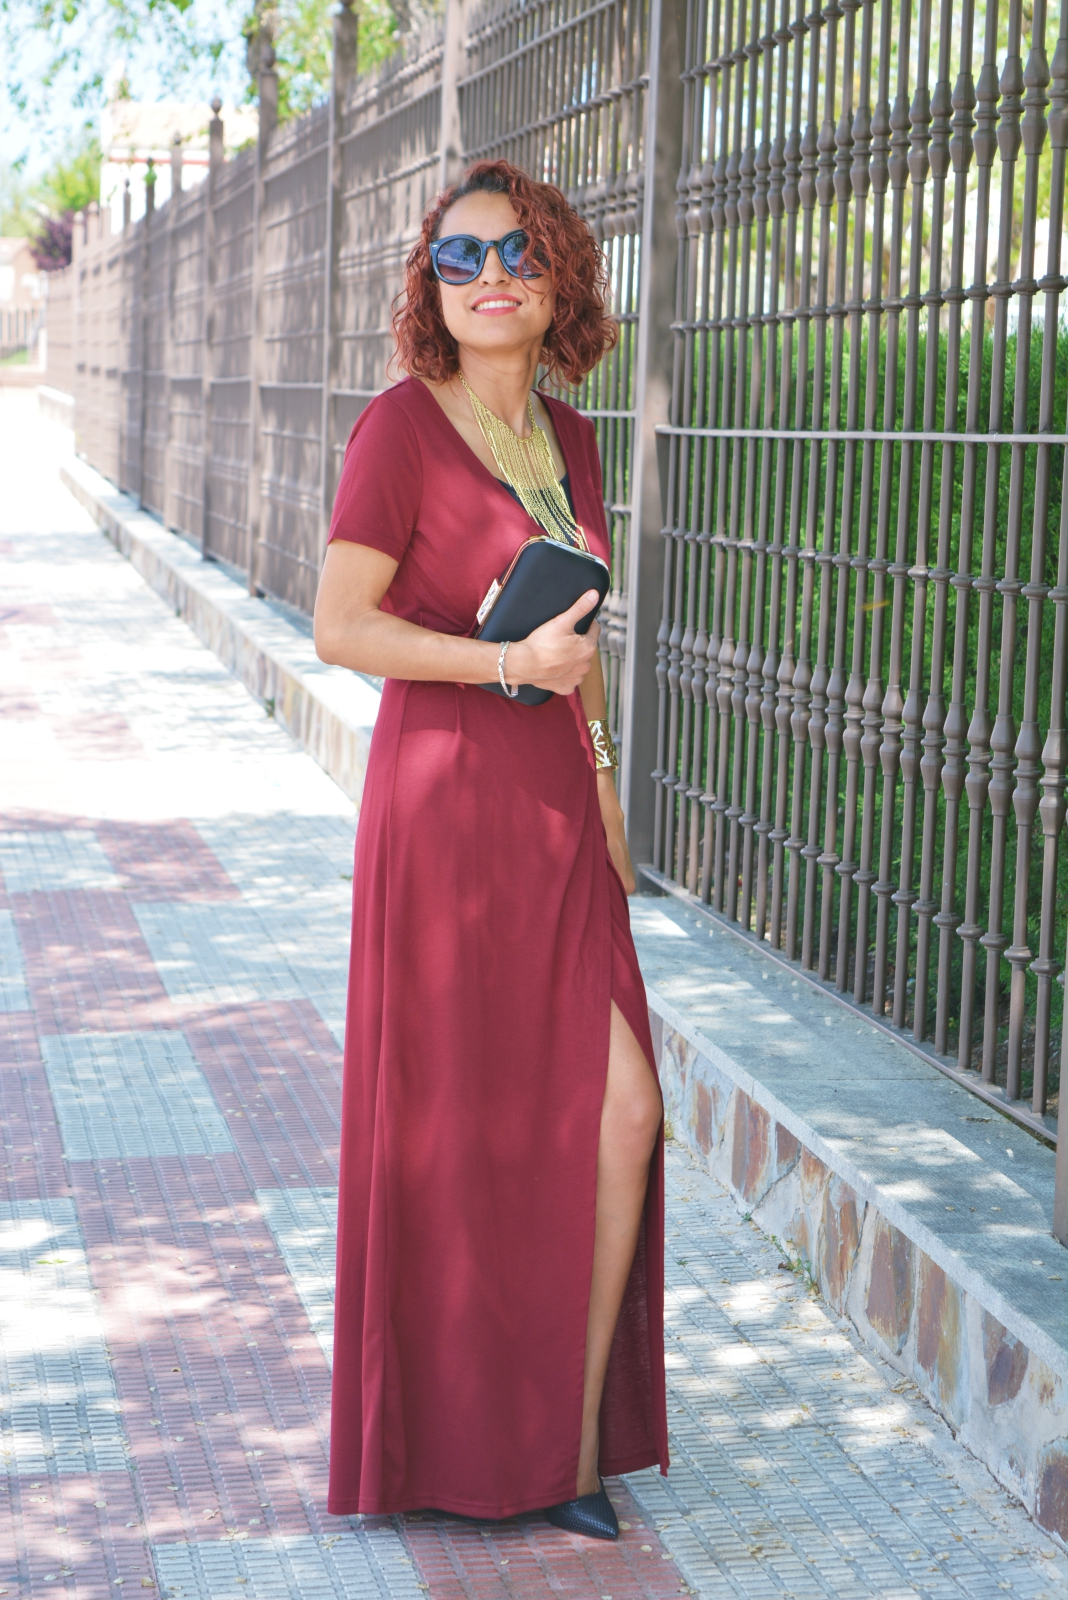 Vestido rojo formal